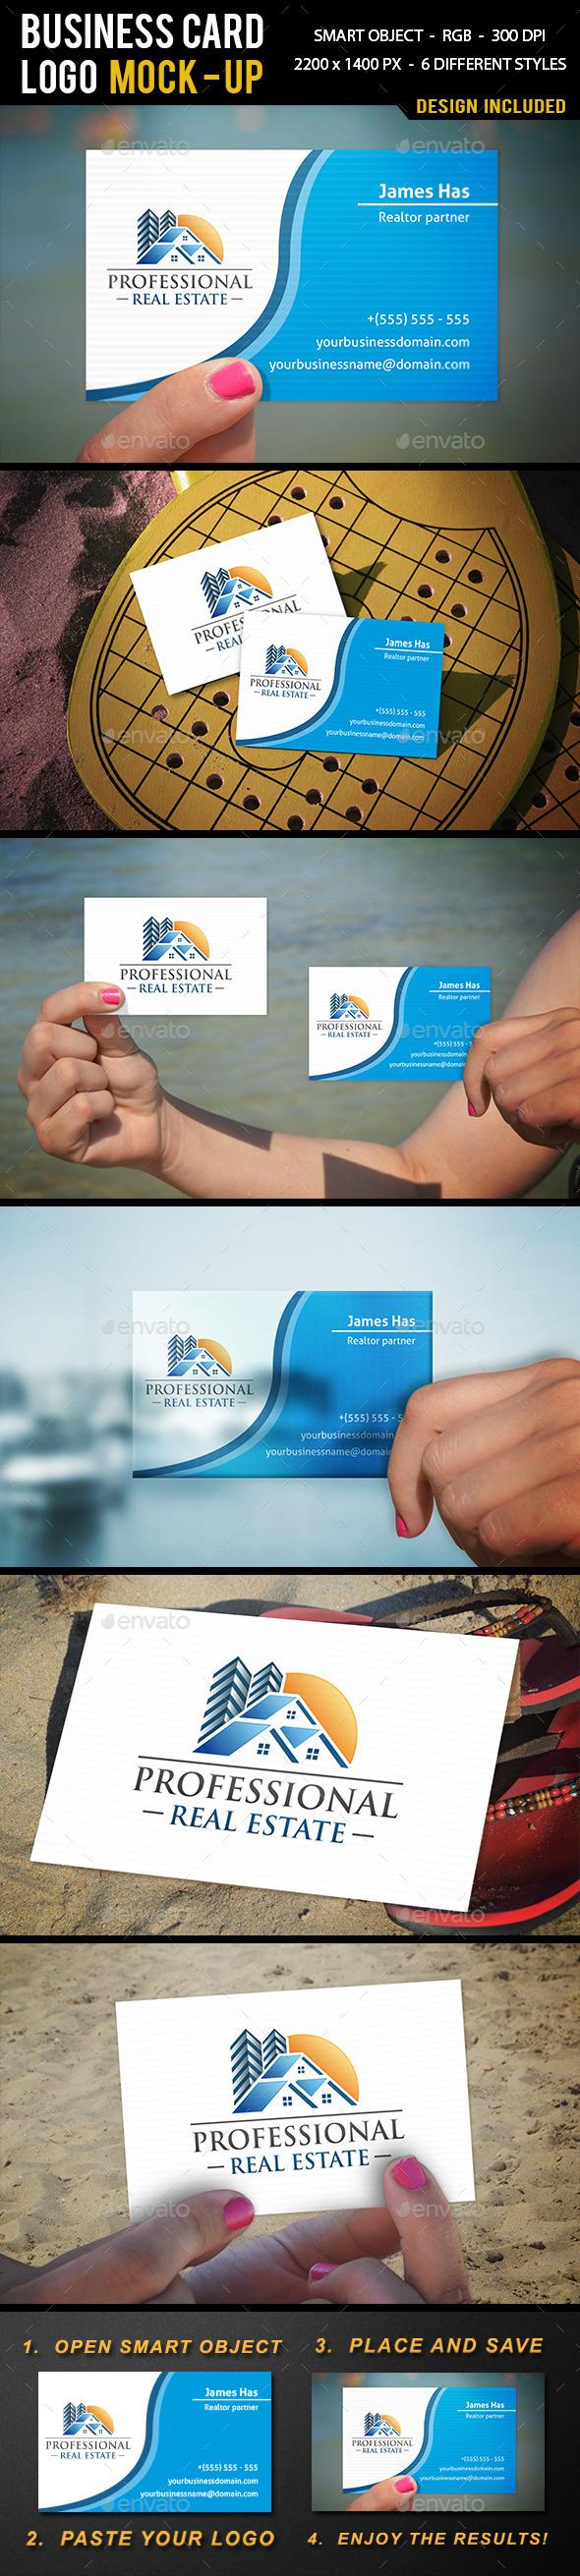 Summer Business Card Mock Up - Business Cards Print